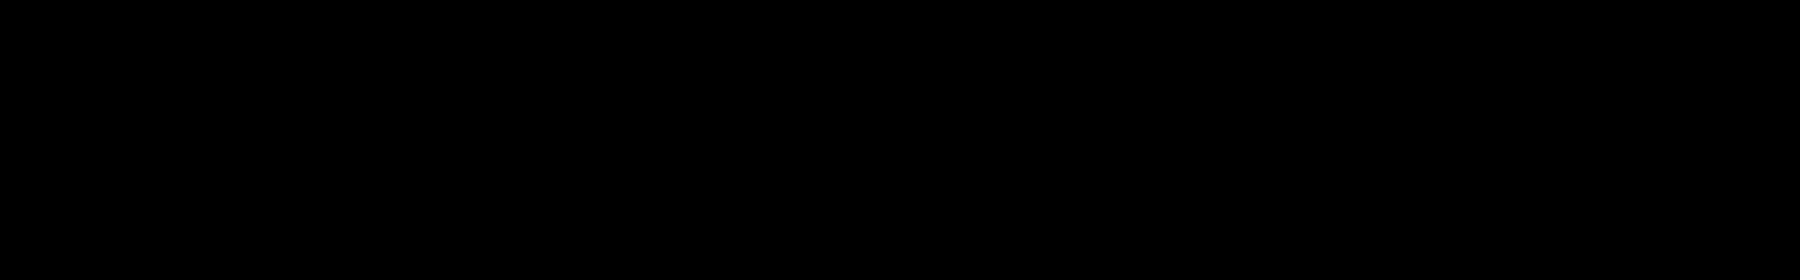 Ableton Beats Deep House audio waveform